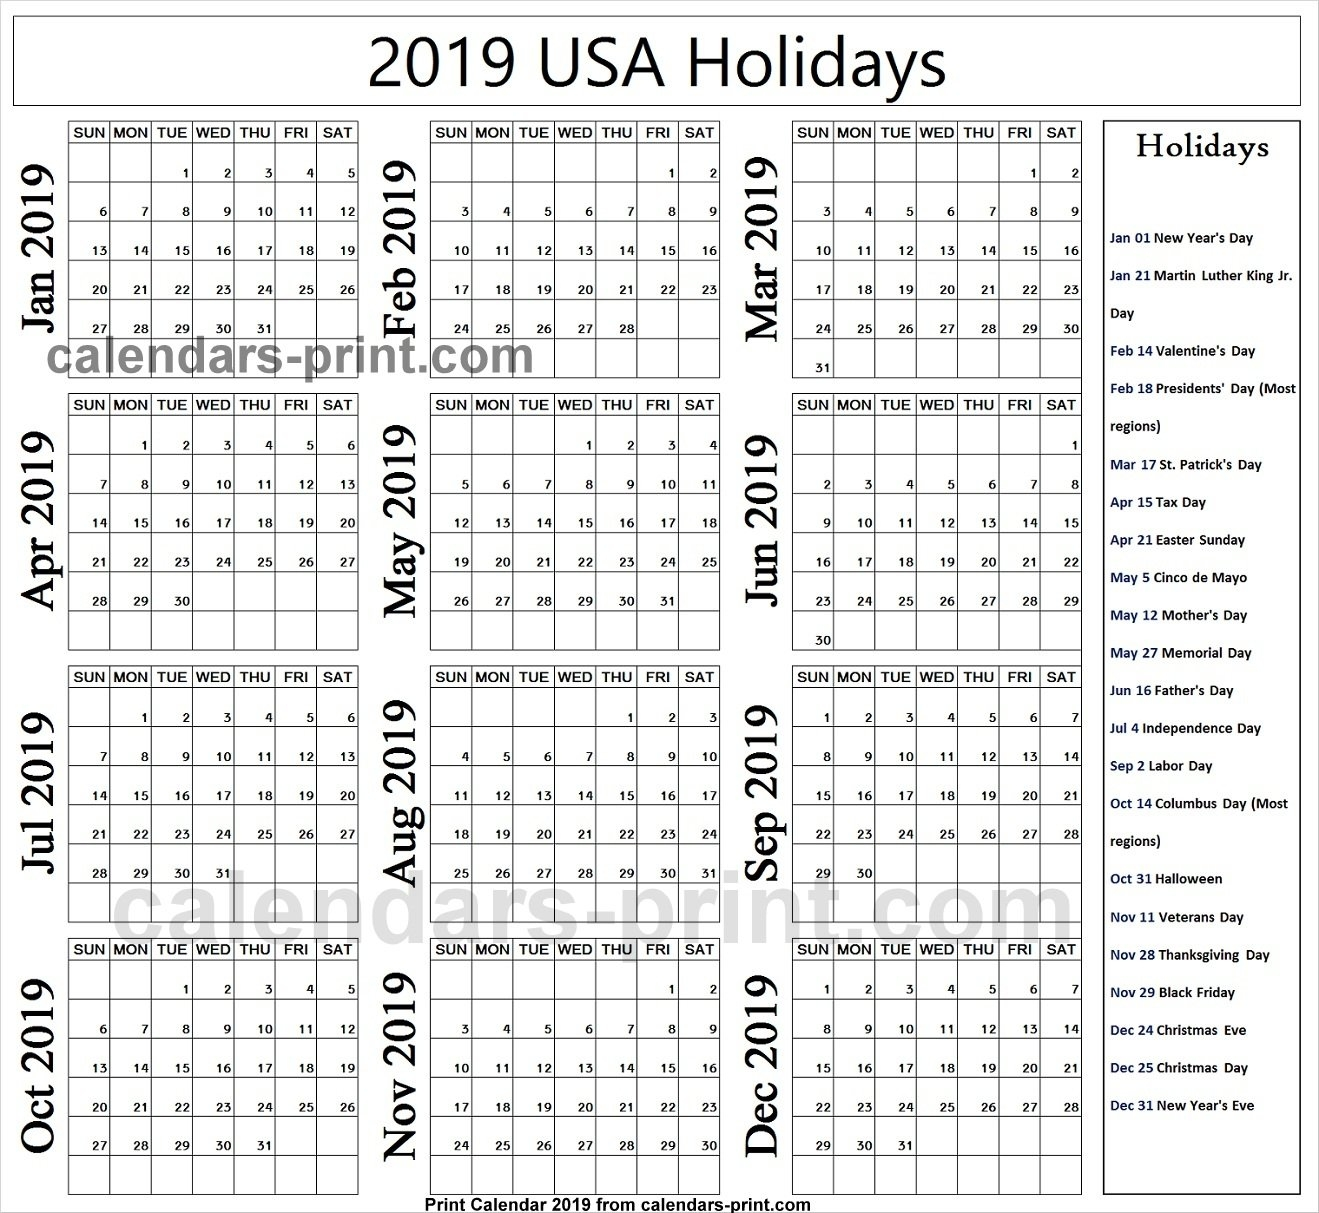 2019 Us Calendar With Federal Holidays | 2019 Usa Calendar Calendar 2019 With Us Holidays